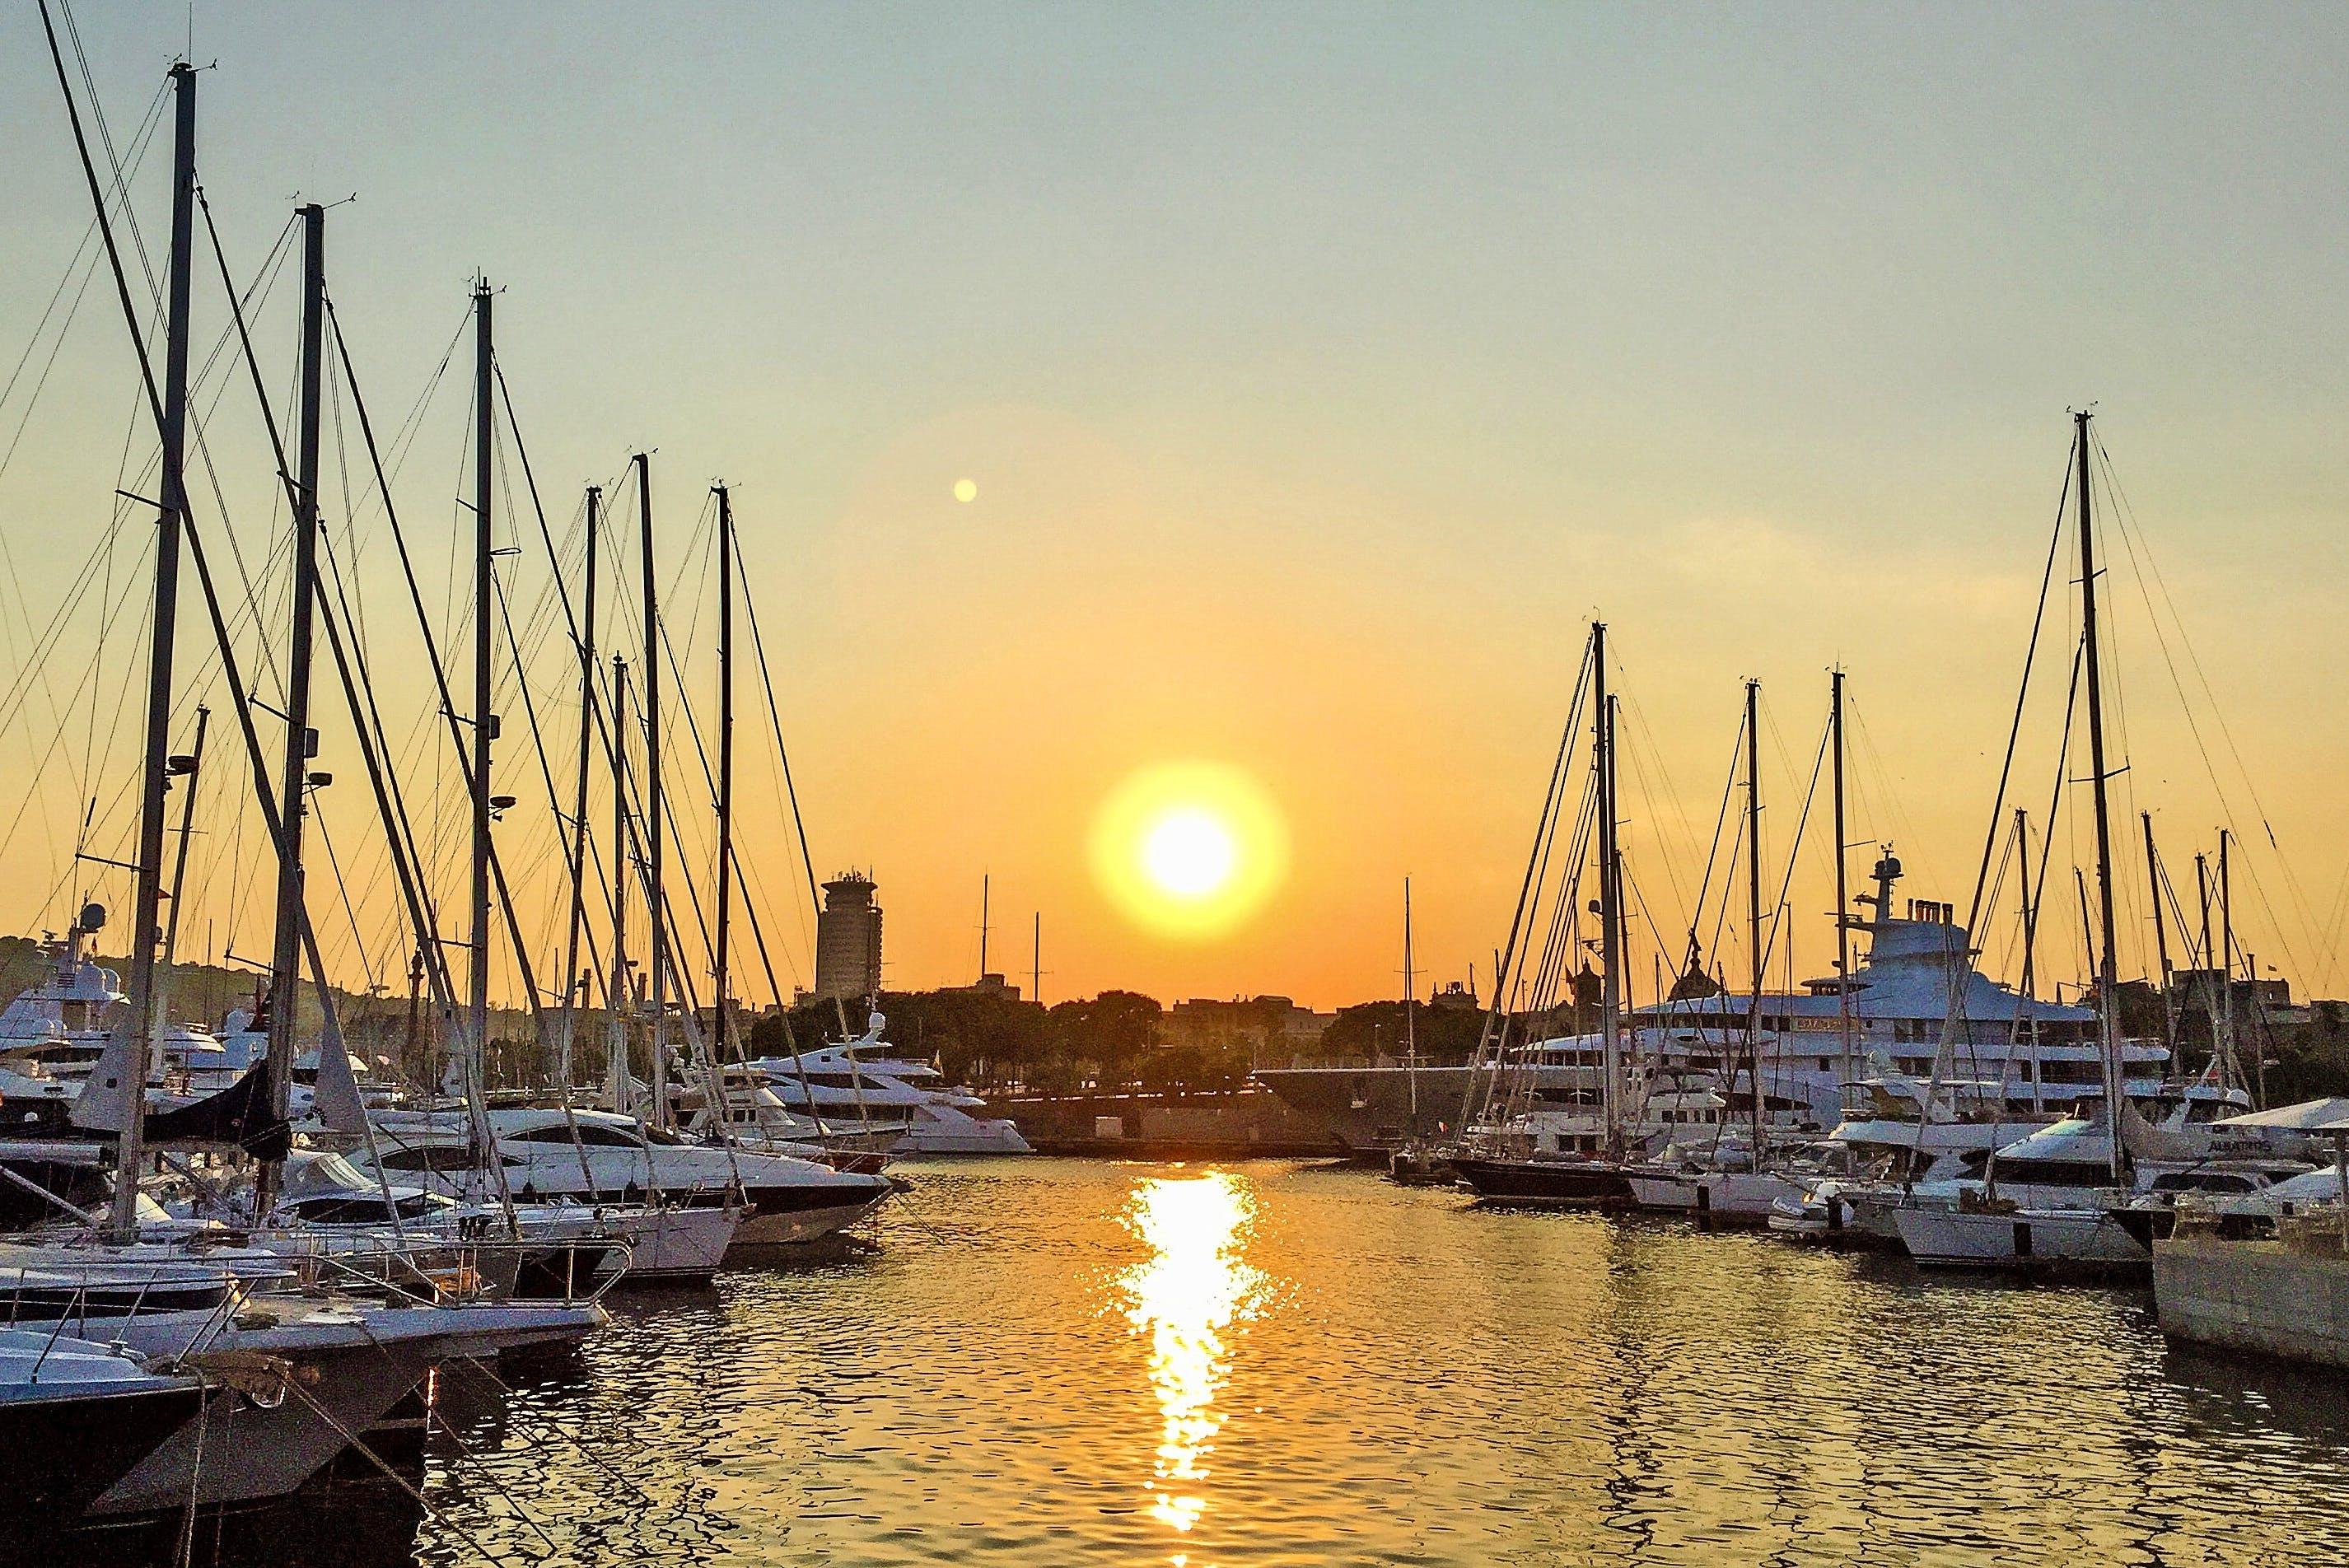 Fotos de stock gratuitas de agua, amanecer, cielo, frente al mar